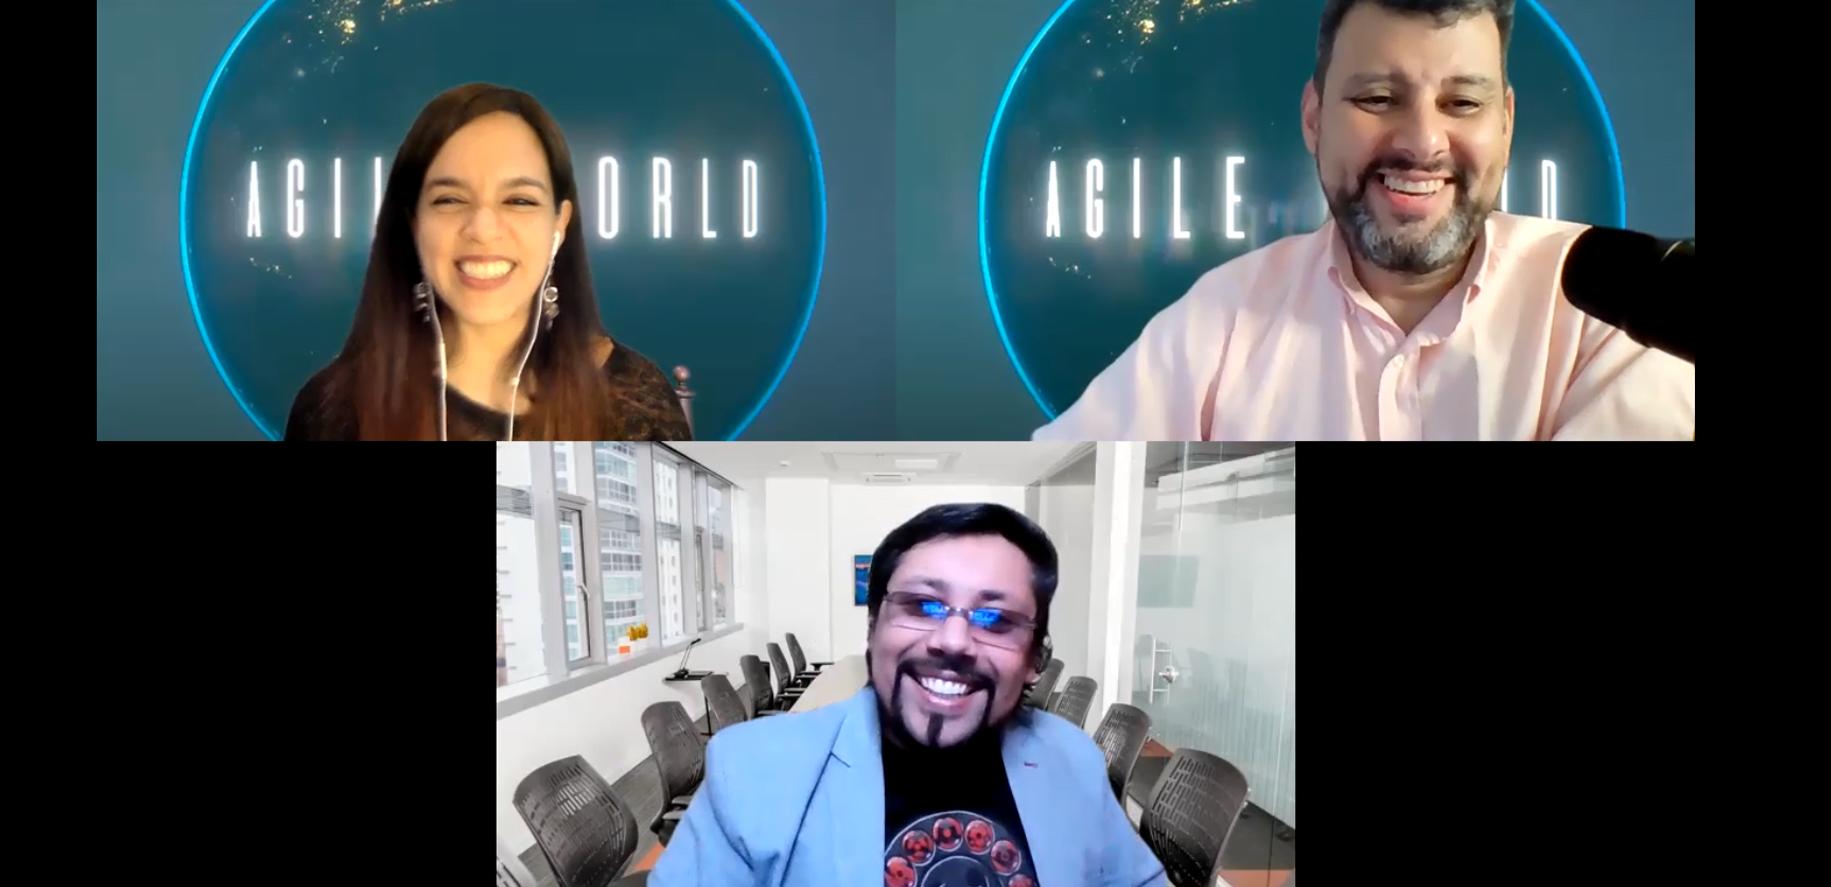 Agile World en Español Alexis Hidalgo, de Chile